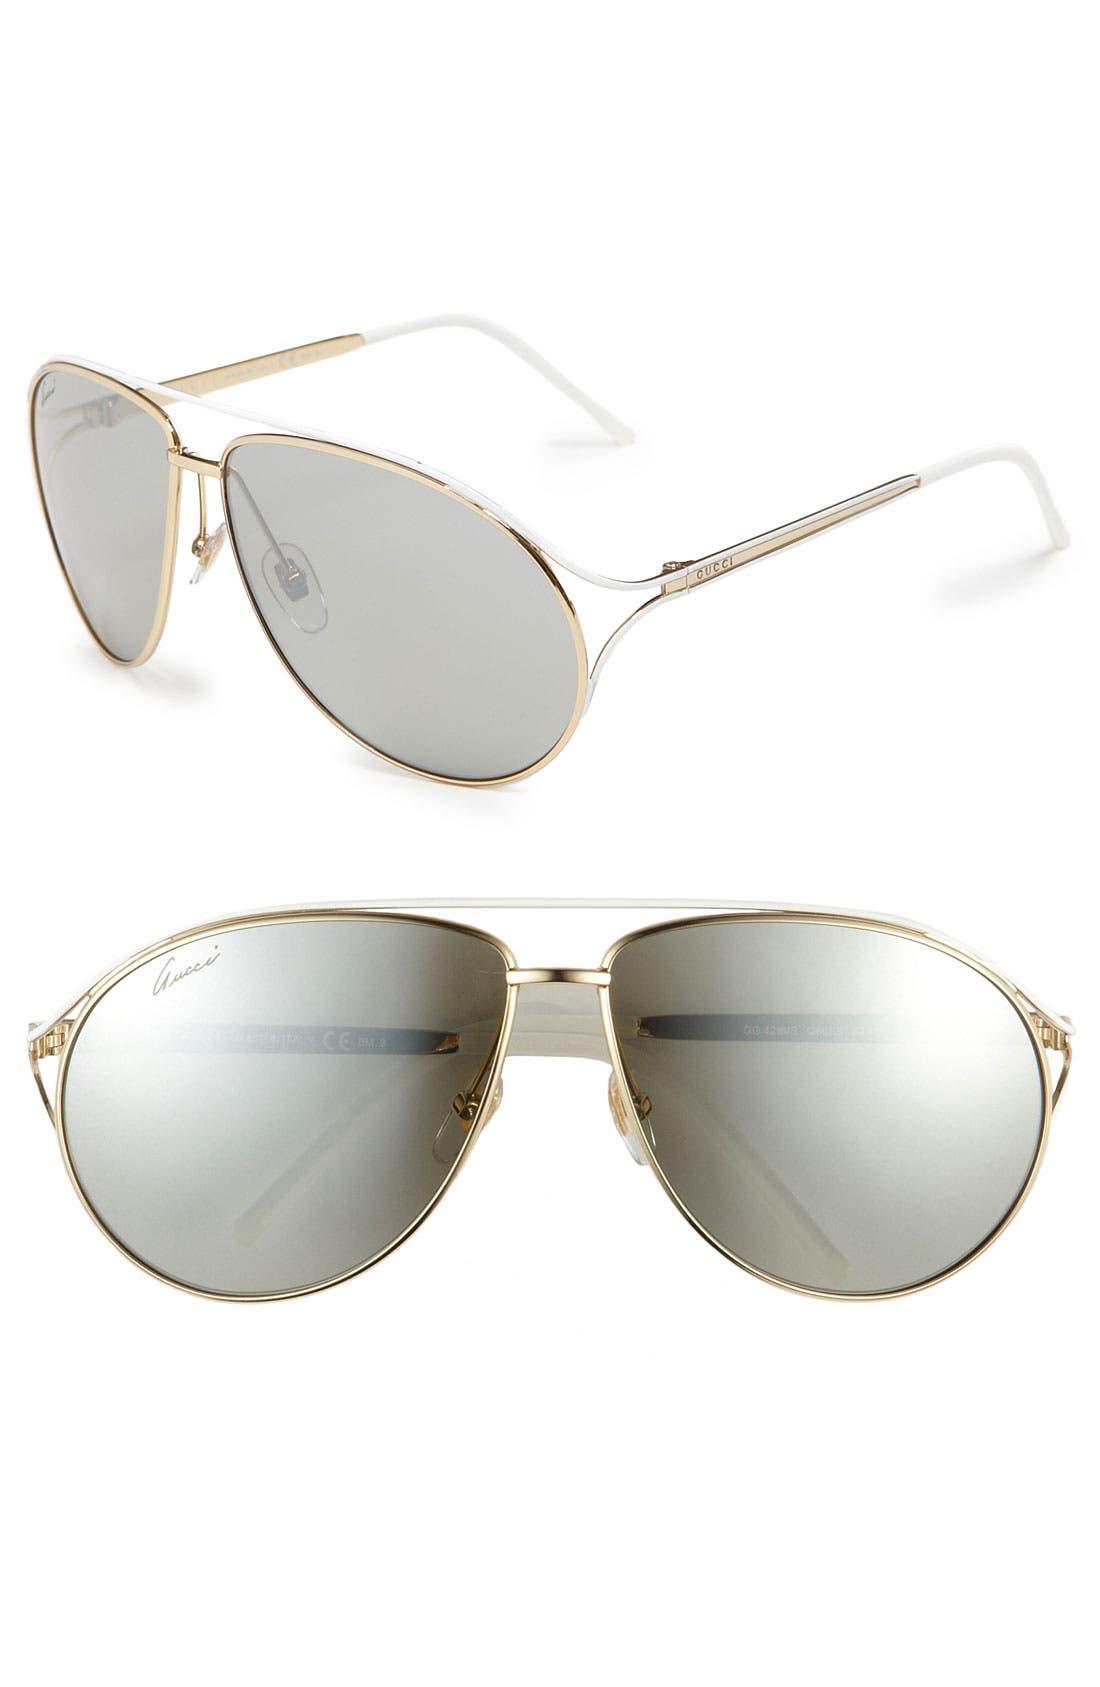 Main Image - Gucci Metal Aviator Sunglasses